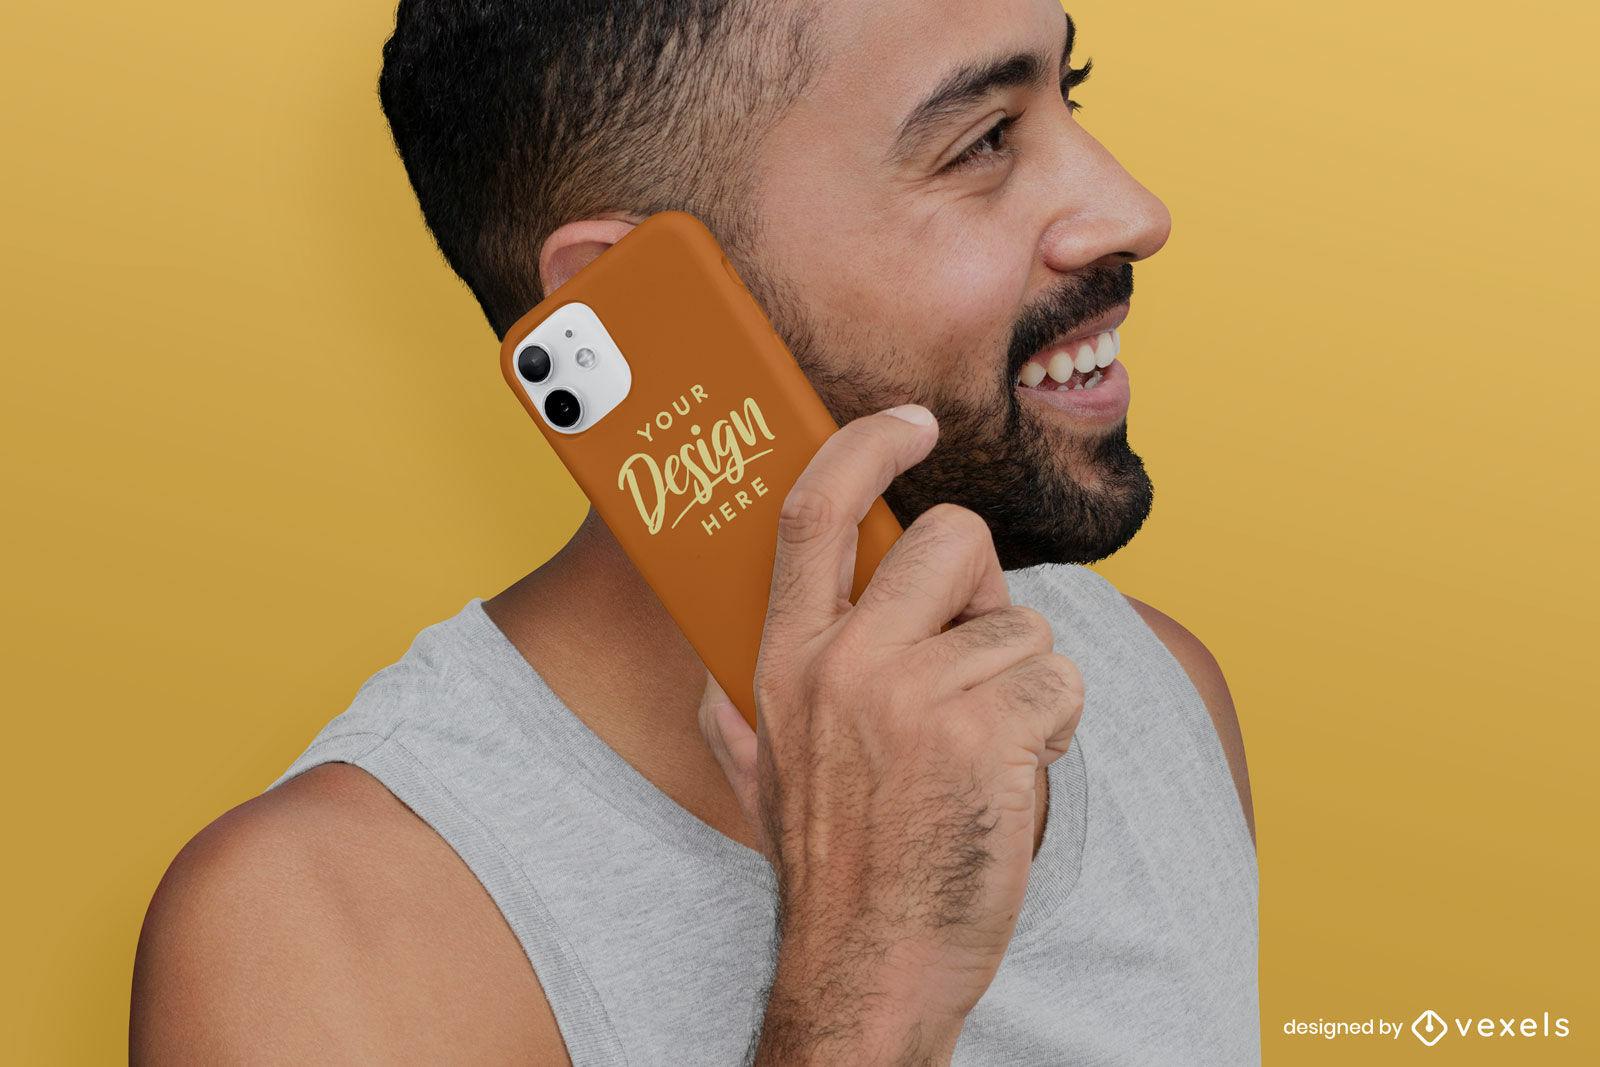 Mann lacht mit Handyhüllenmodell